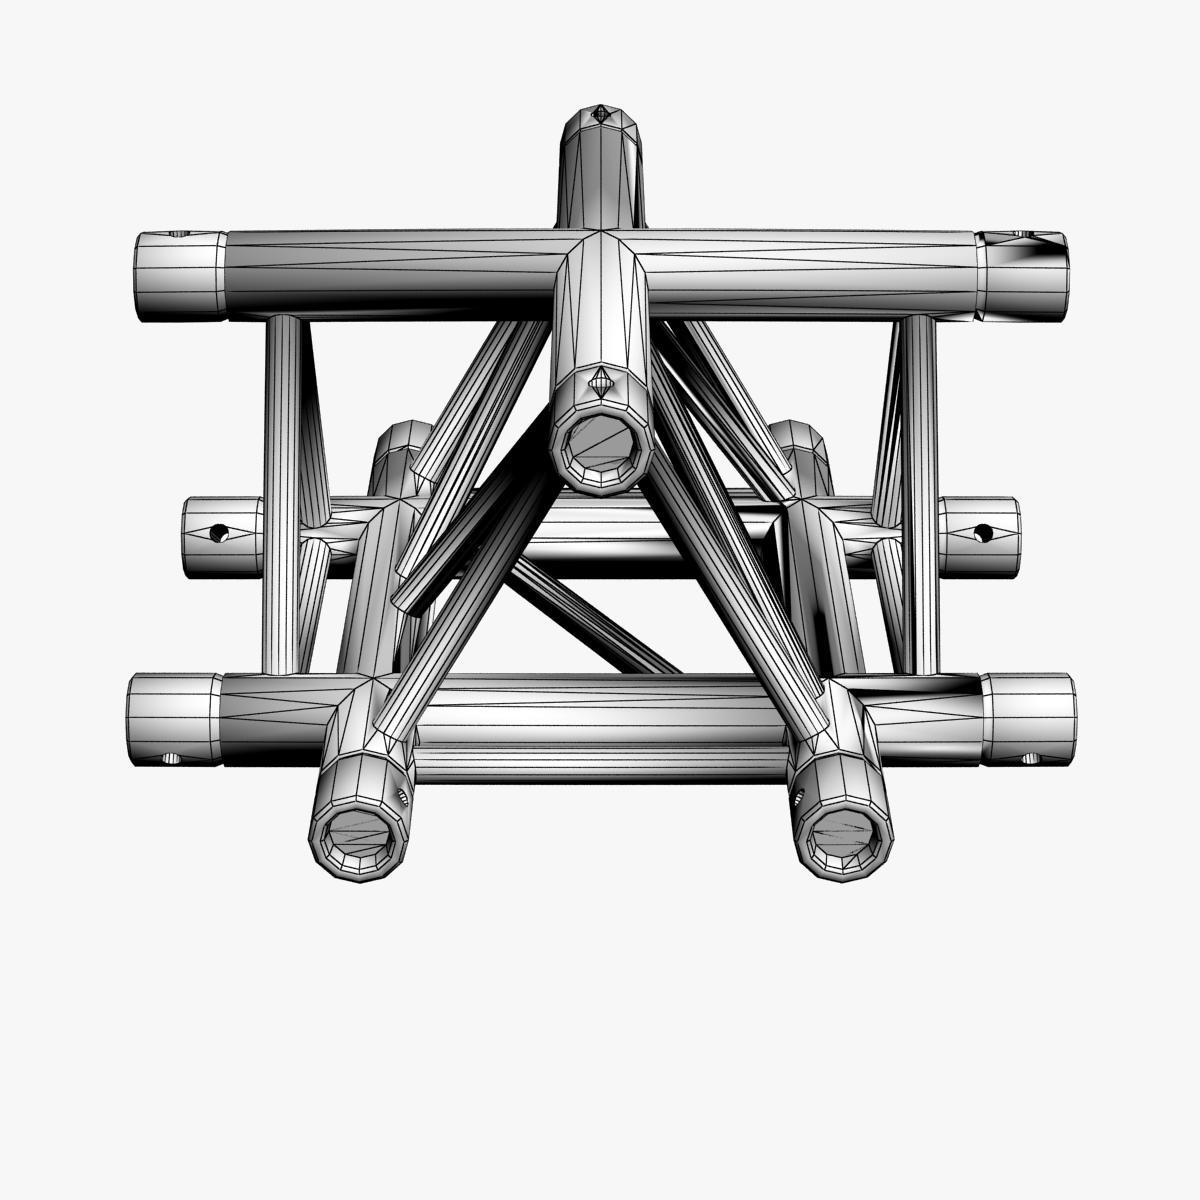 triangular trusses (collection 55 modular pieces) 3d model 3ds max dxf fbx c4d dae texture obj 216228